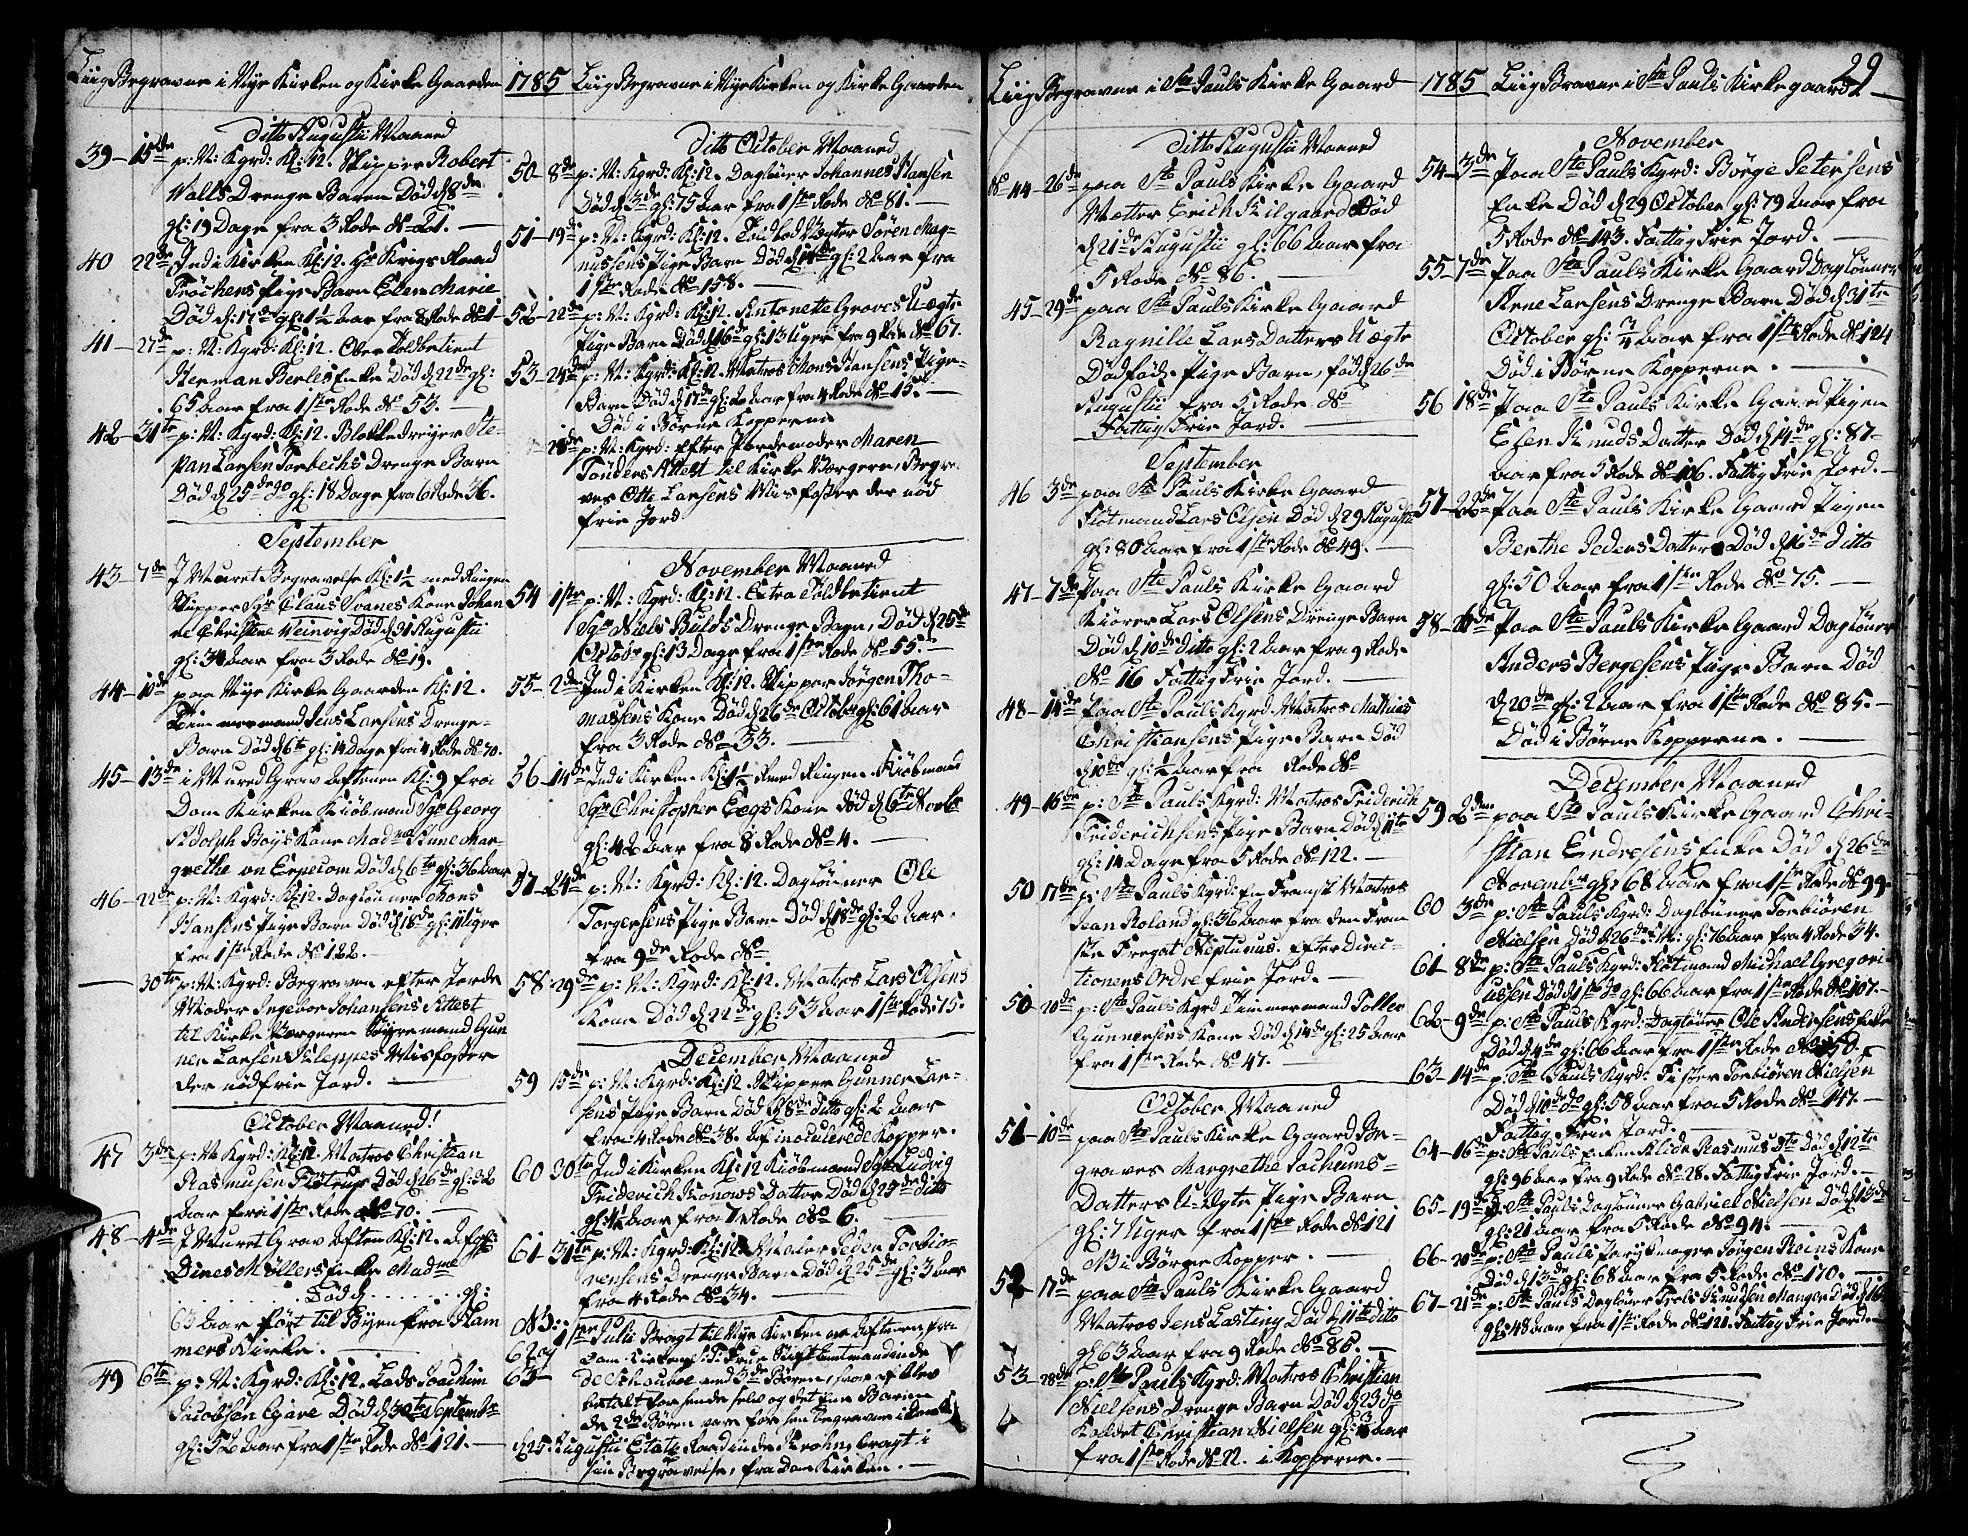 SAB, Nykirken Sokneprestembete, H/Hab: Klokkerbok nr. A 3, 1775-1820, s. 29